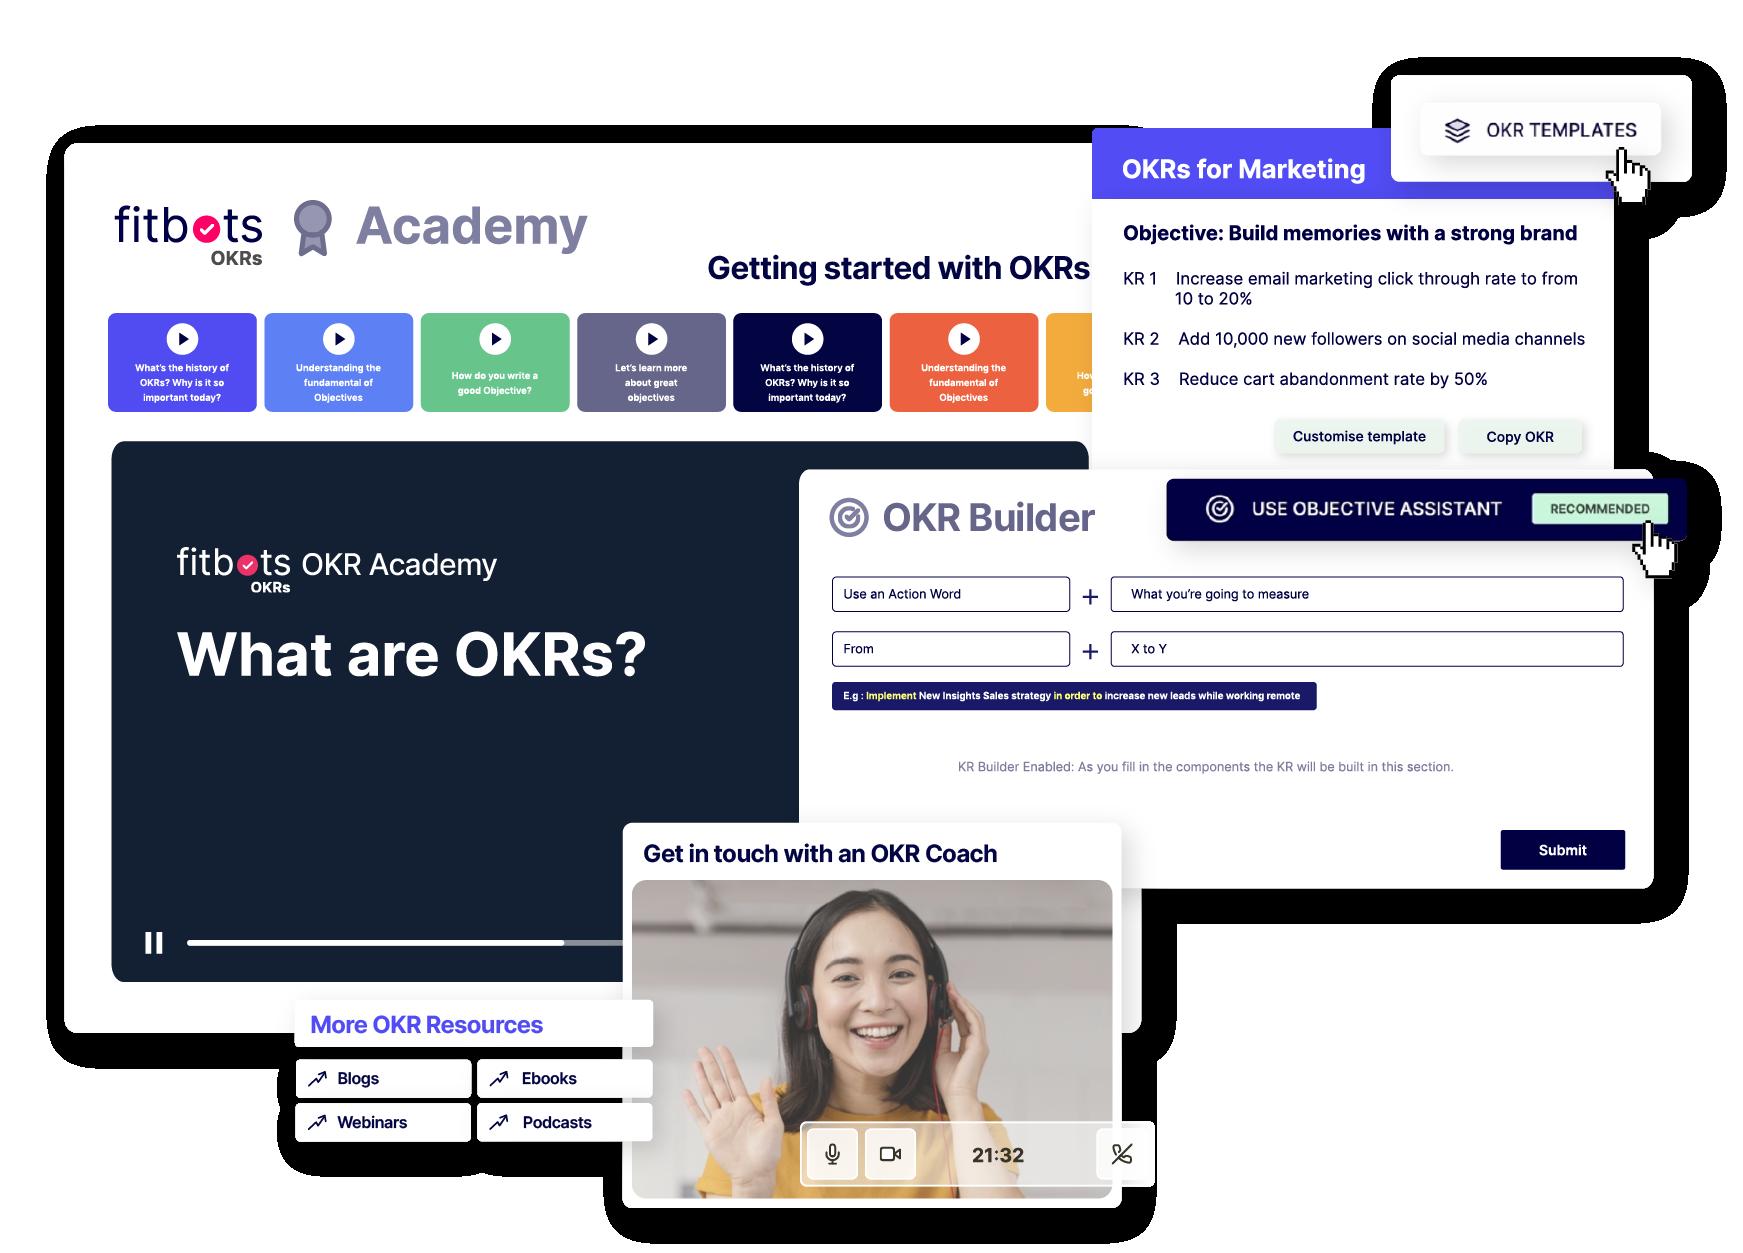 OKR Builders . Fitbots OKR Software   Best OKR Experts Best OKR Coaches Best OKR Software Best OKR Certification Best OKR Platform OKRs vs KPIs What are OKRs ? Best OKR Tool